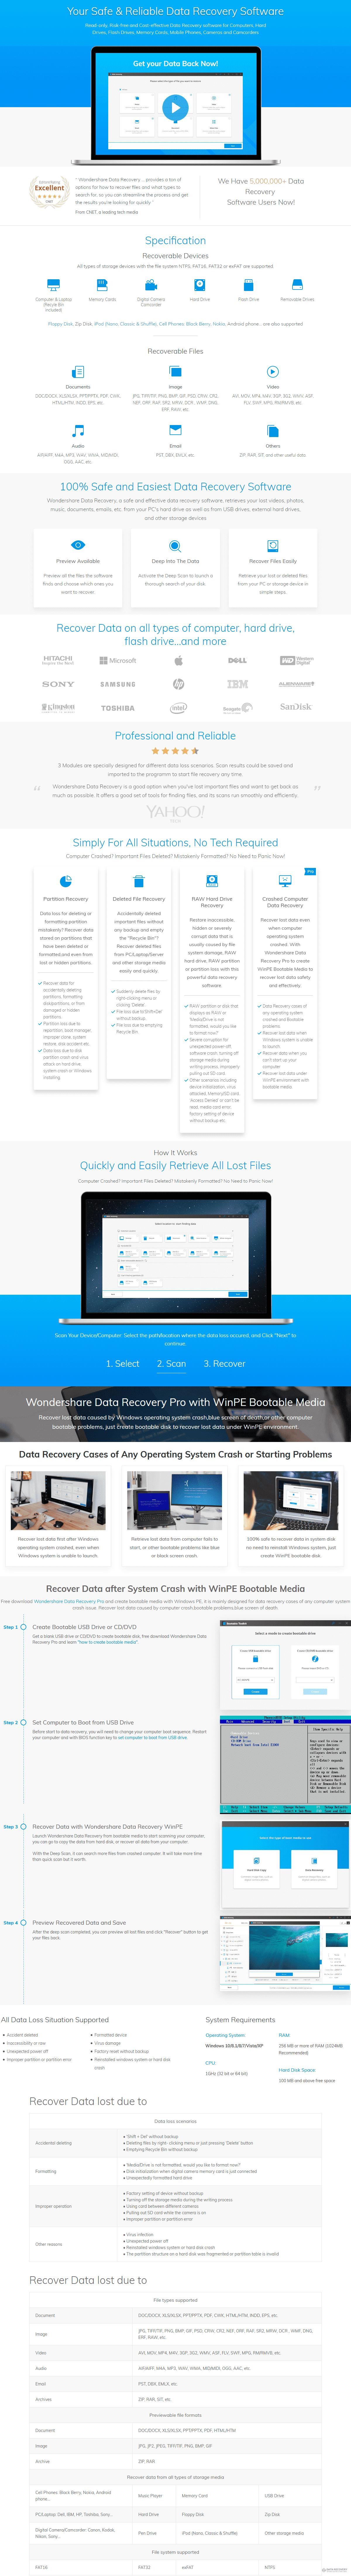 Wondershare data recovery coupon